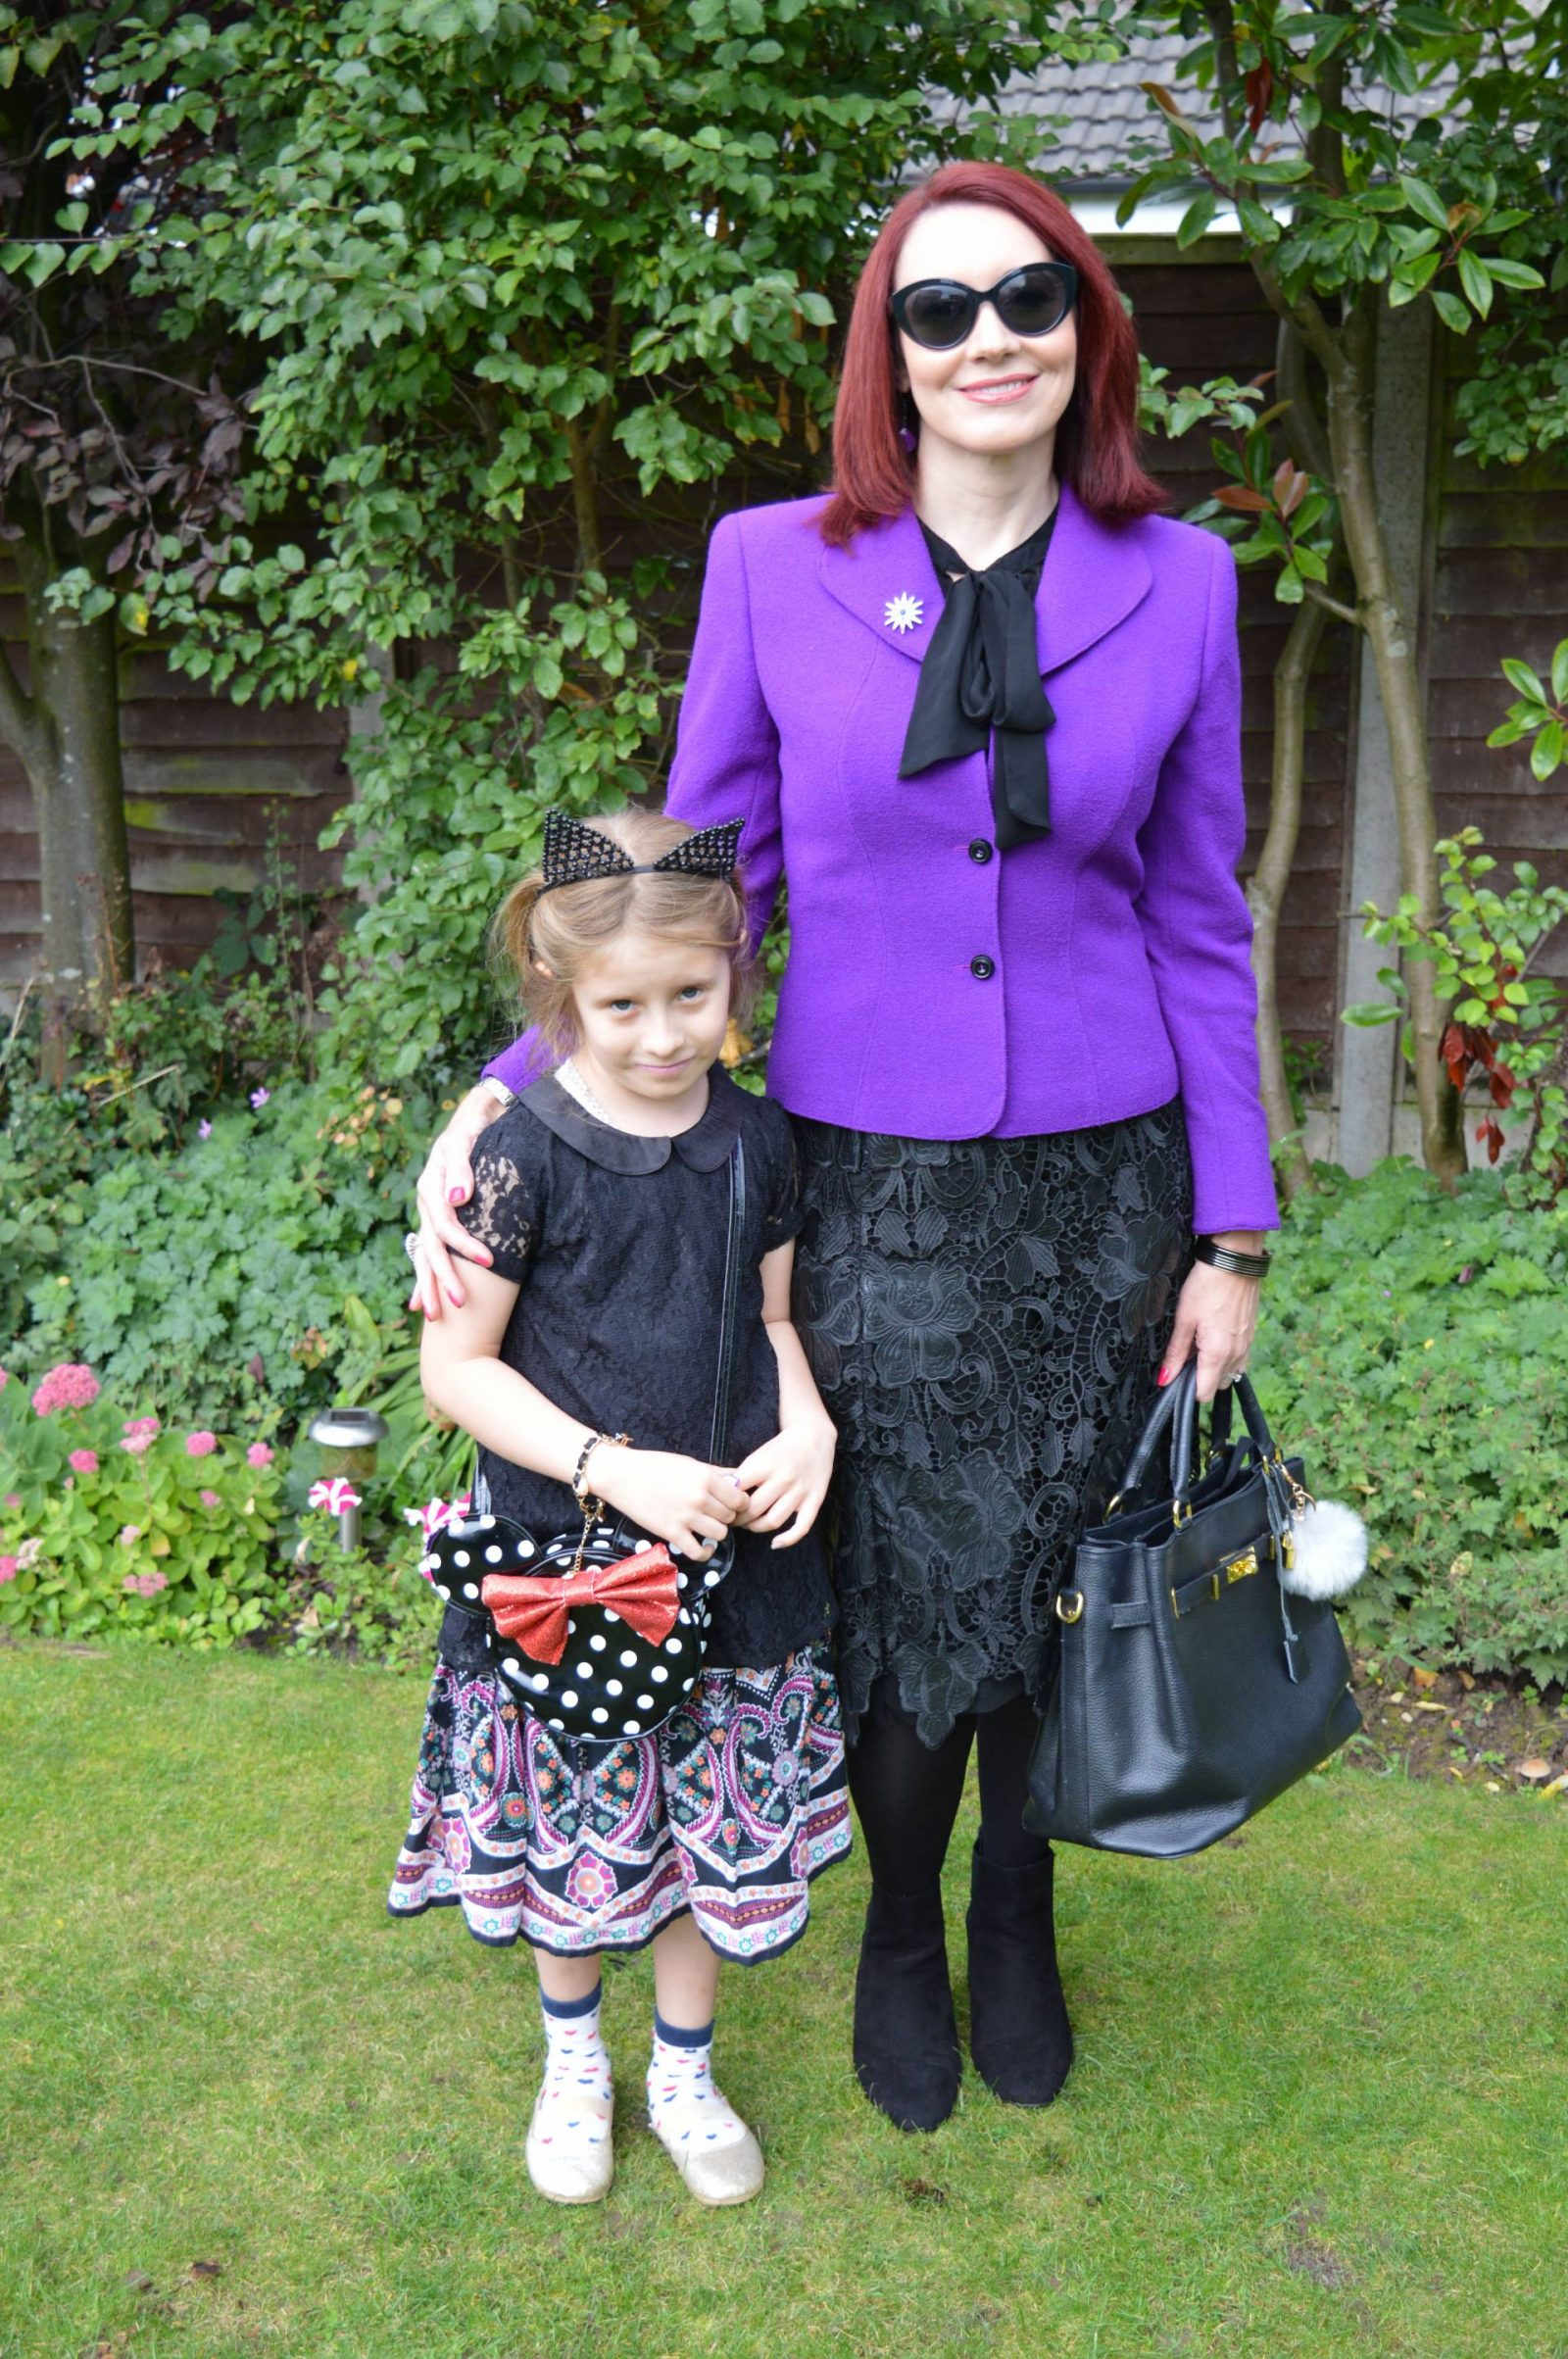 Purple Escada Jacket and Black Lace Skirt